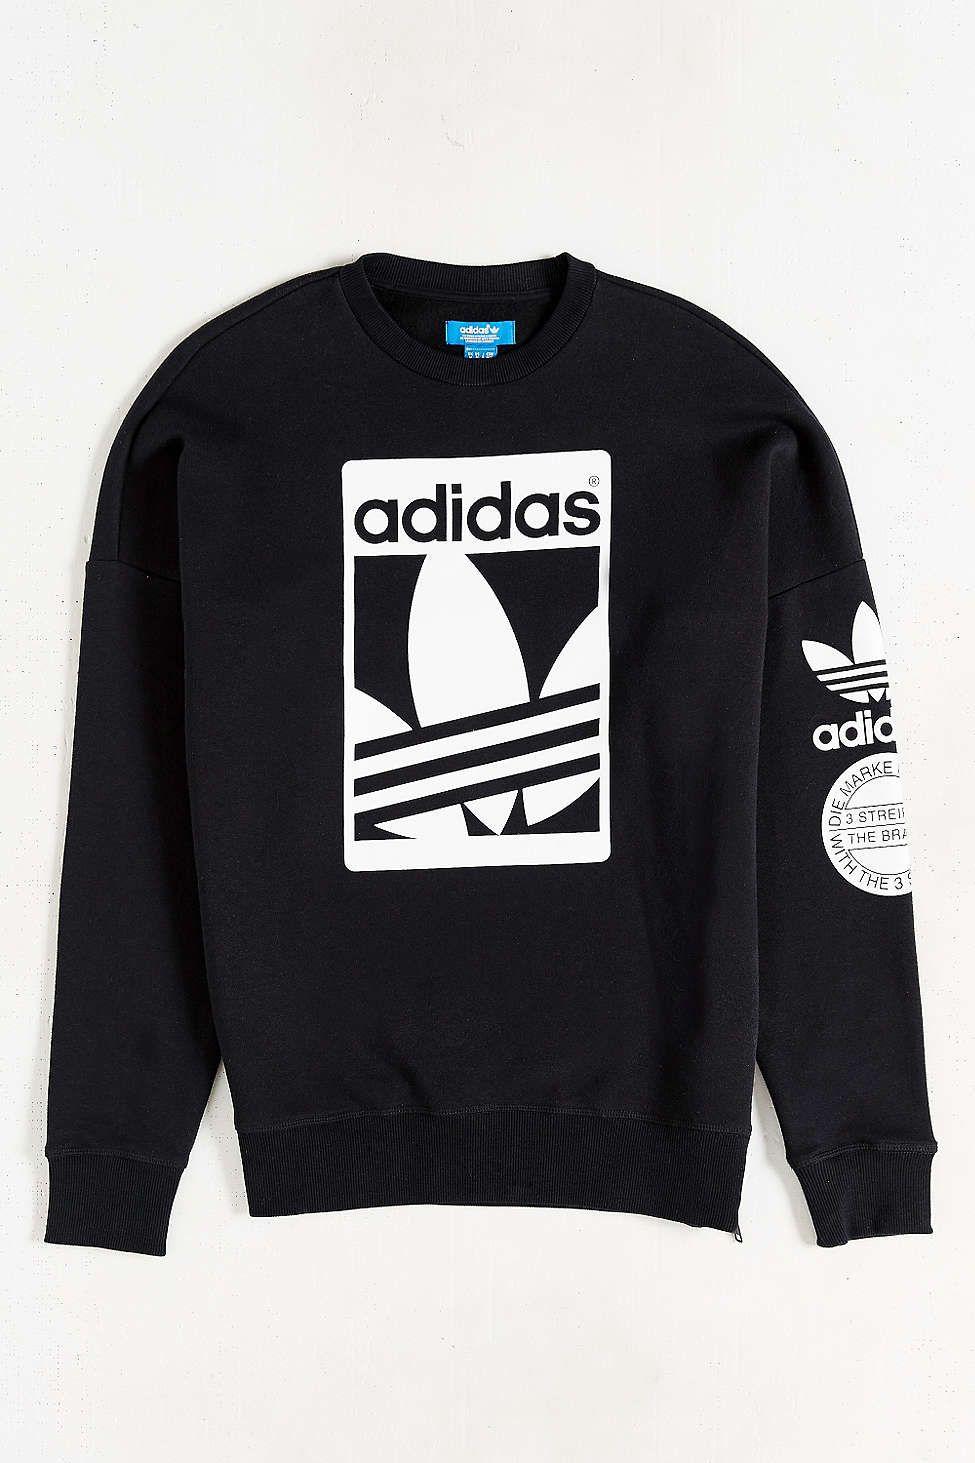 adidas Originals Box Trefoil Graphic Sweatshirt | Gym outfit